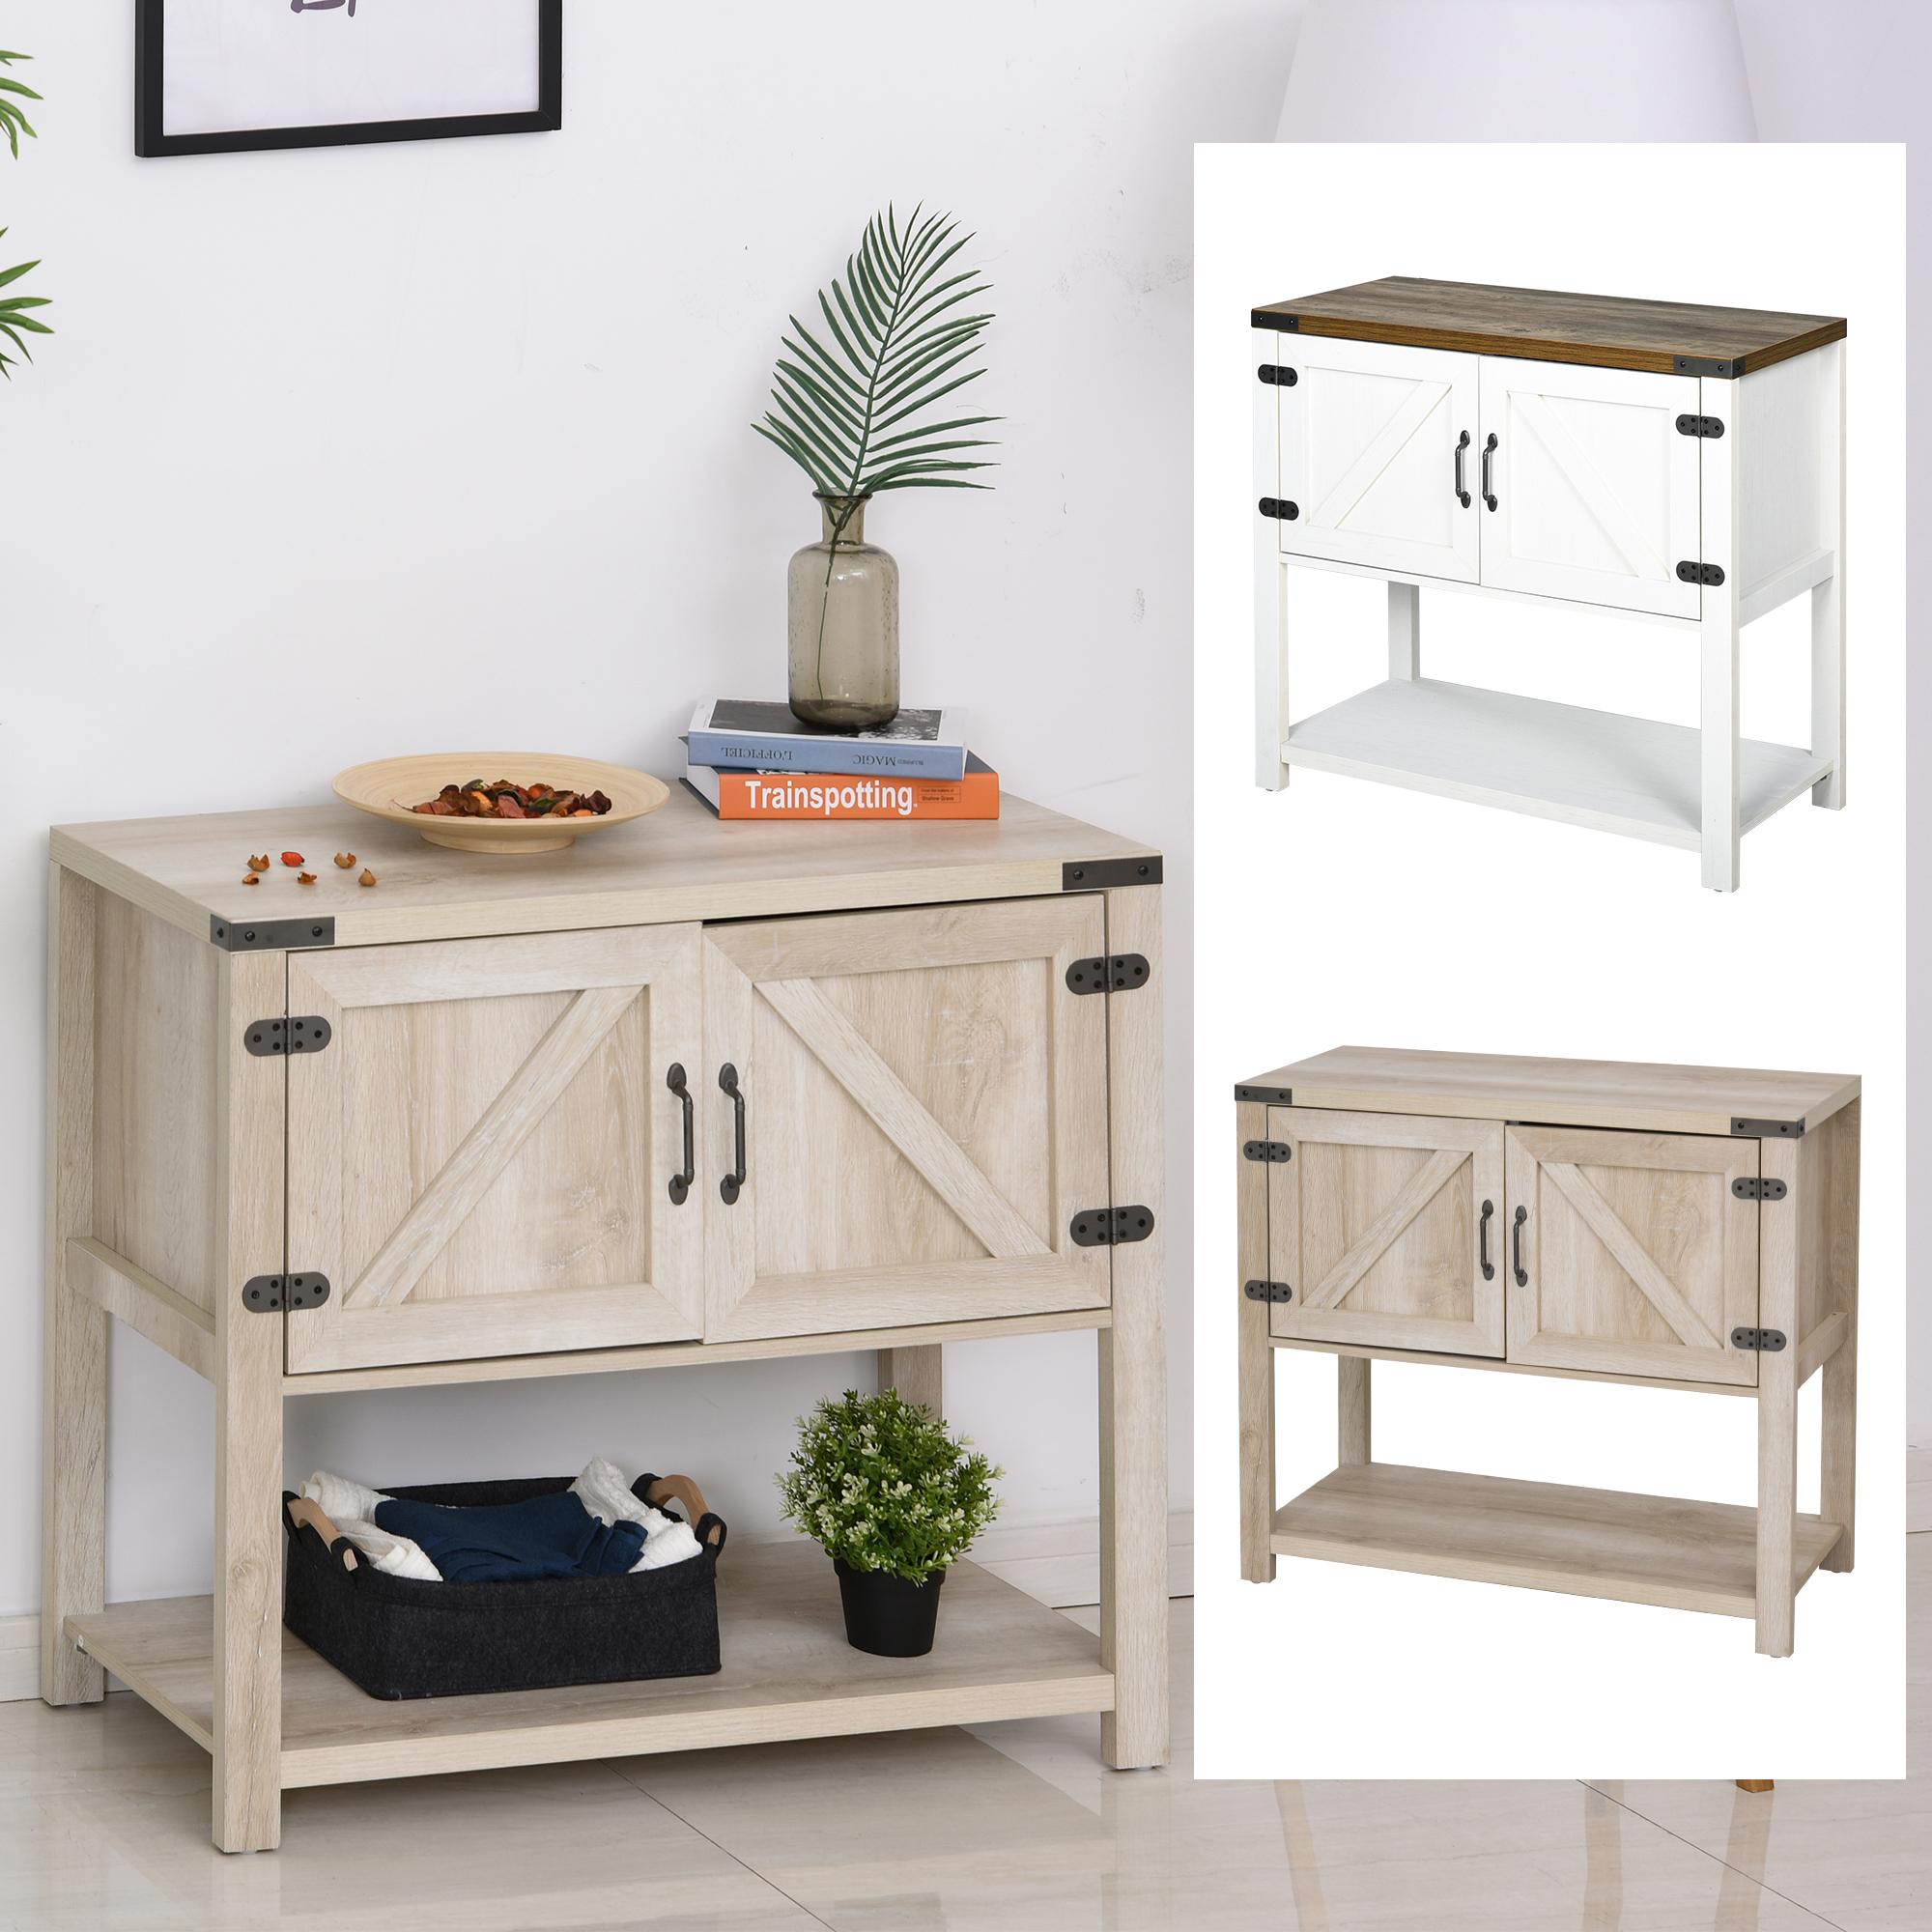 Multipurpose Corner Pantry W Buffet Server Countertop Surface Easy To Clean Ebay